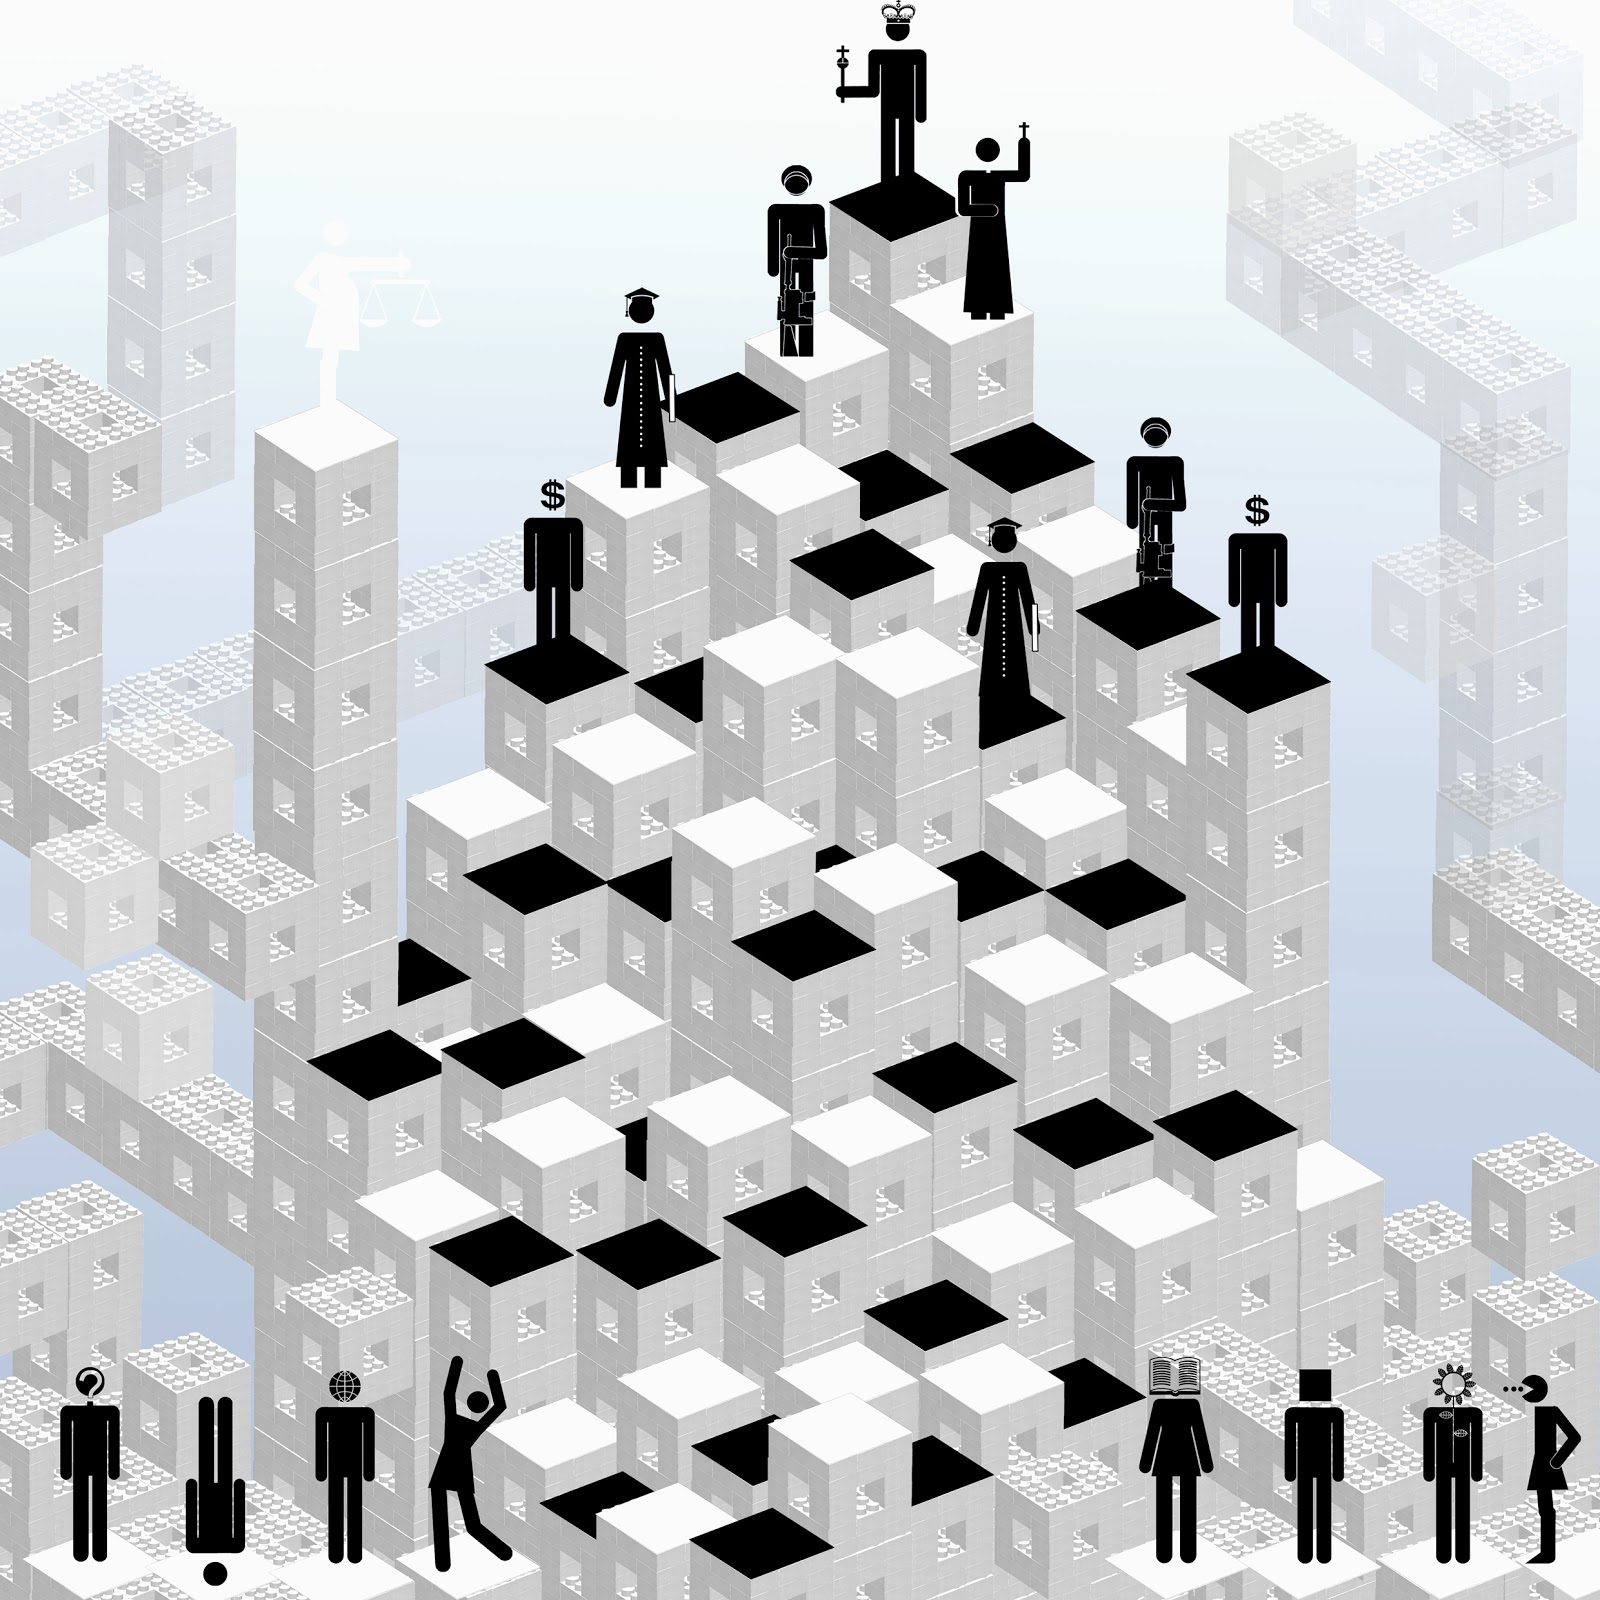 Cooperar, competir, Poder, ajedrez, Escher, inteligenci,